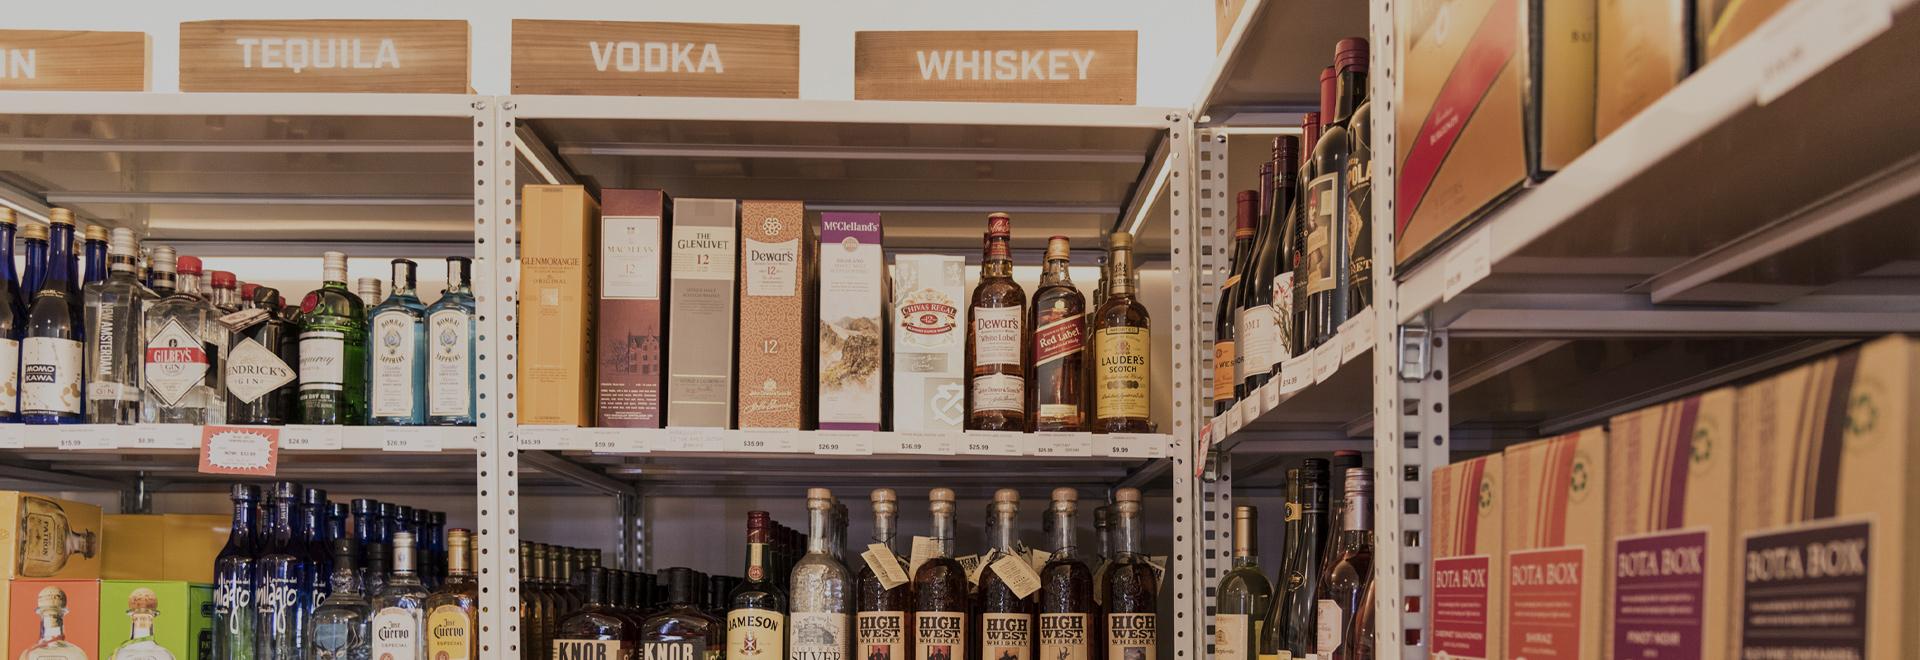 Outpost Spirits State Liquor Store